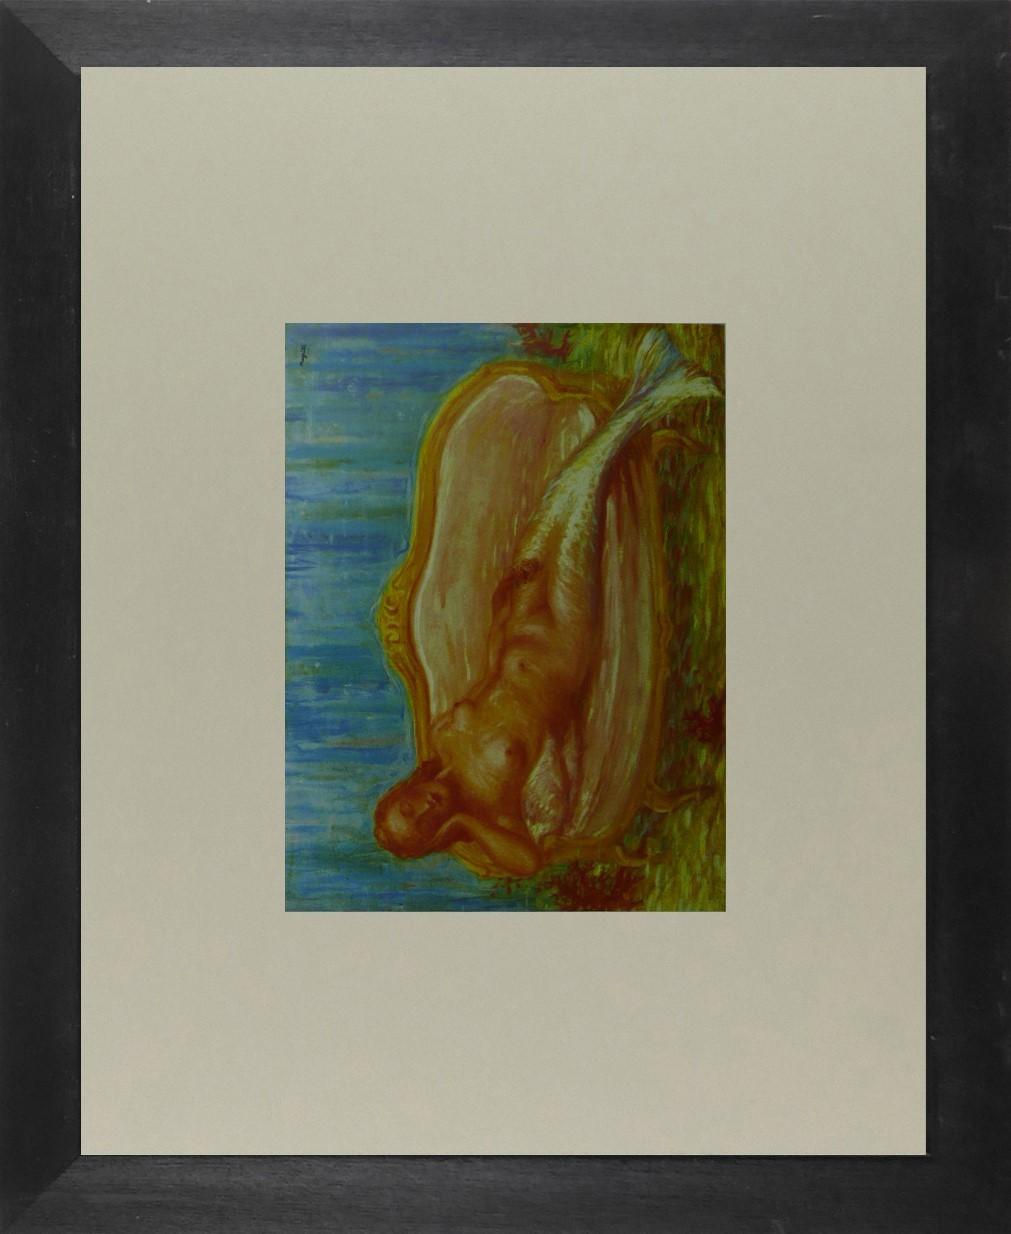 The Forbidden Universe - Ren Magritte - Framed Picture 11 x 14